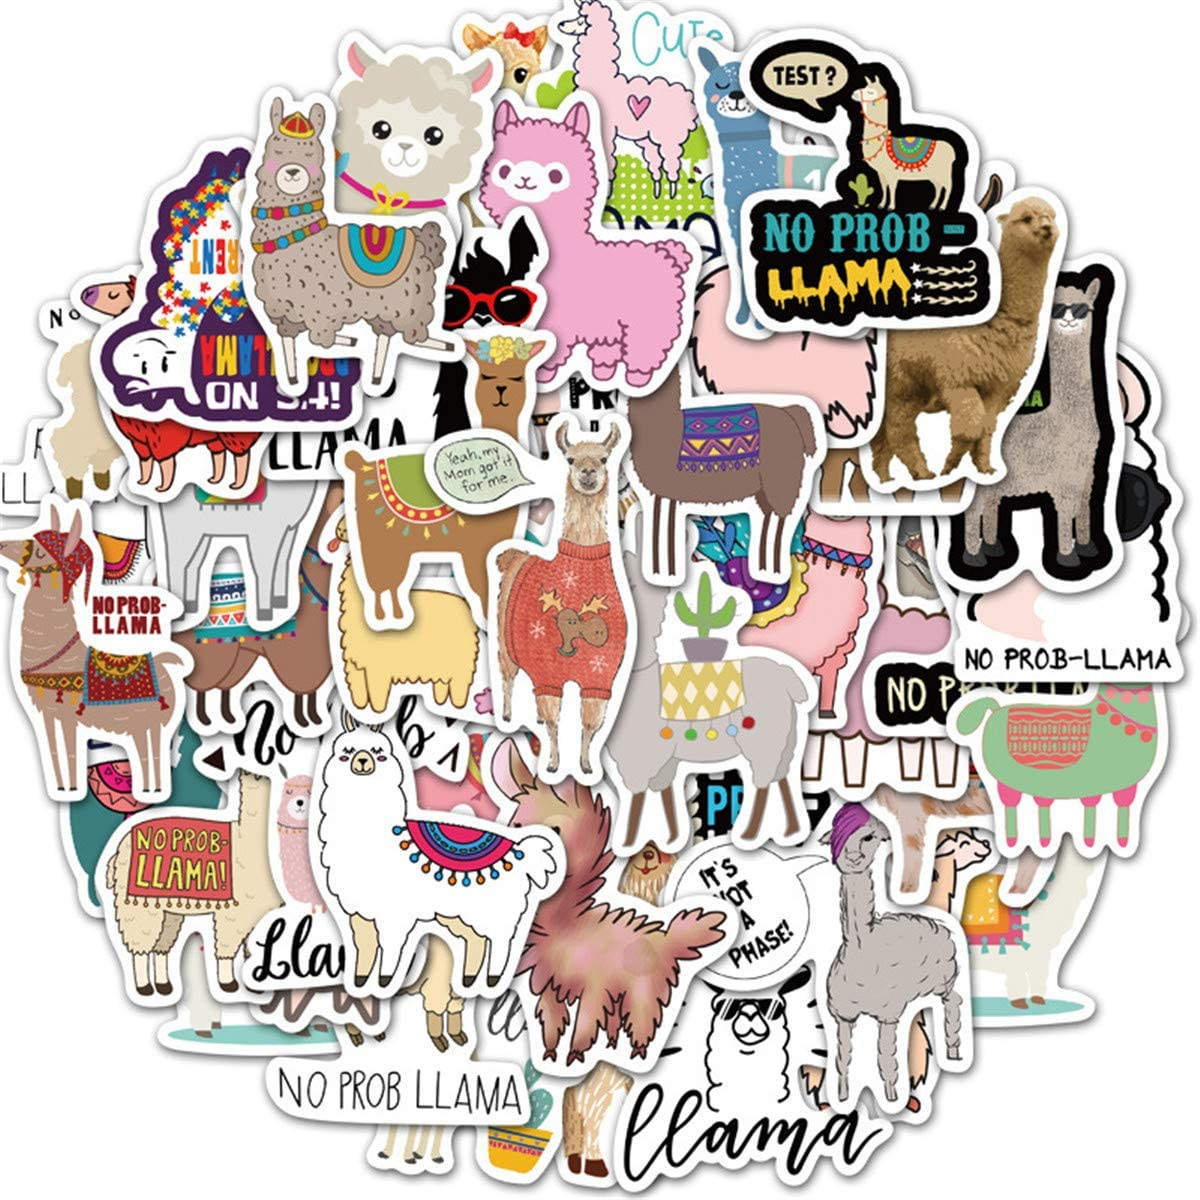 Cute Alpaca Stickers (50 PCS) Funny Internet Pop Animal Stickers for Teens, Girls, Adults,Kids - Stickers for Waterbottles,Laptop,Phone,Hydro Flask - Waterproof Vinyl Sticker (Alpaca)